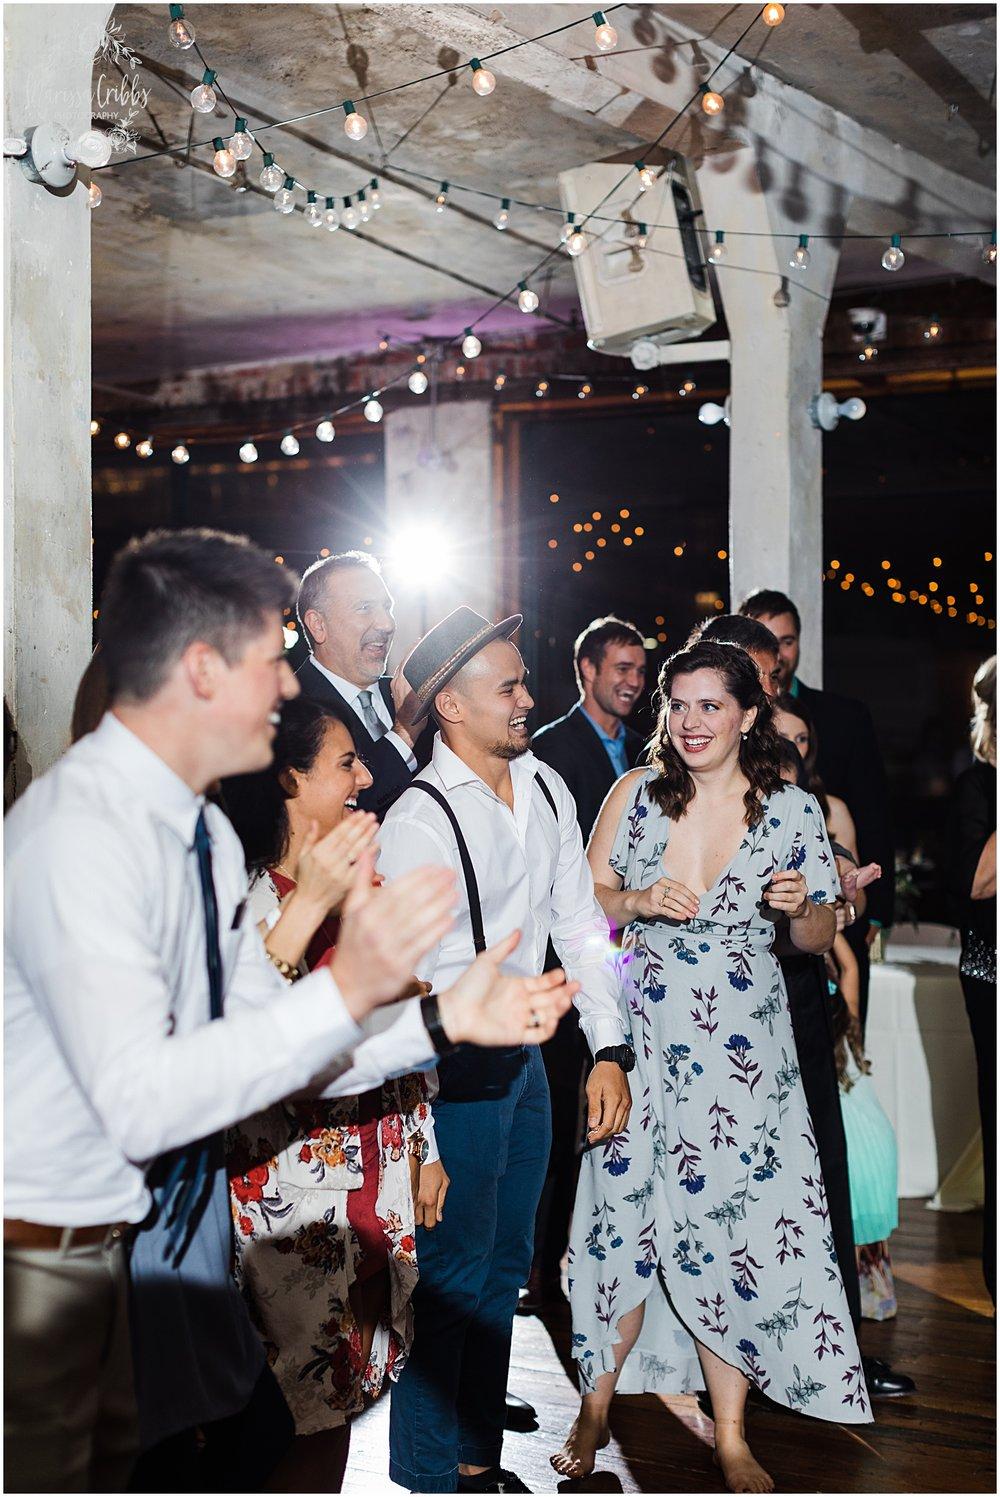 BAUER WEDDING   KELSEA & JUSTIN   MARISSA CRIBBS PHOTOGRAPHY_6612.jpg